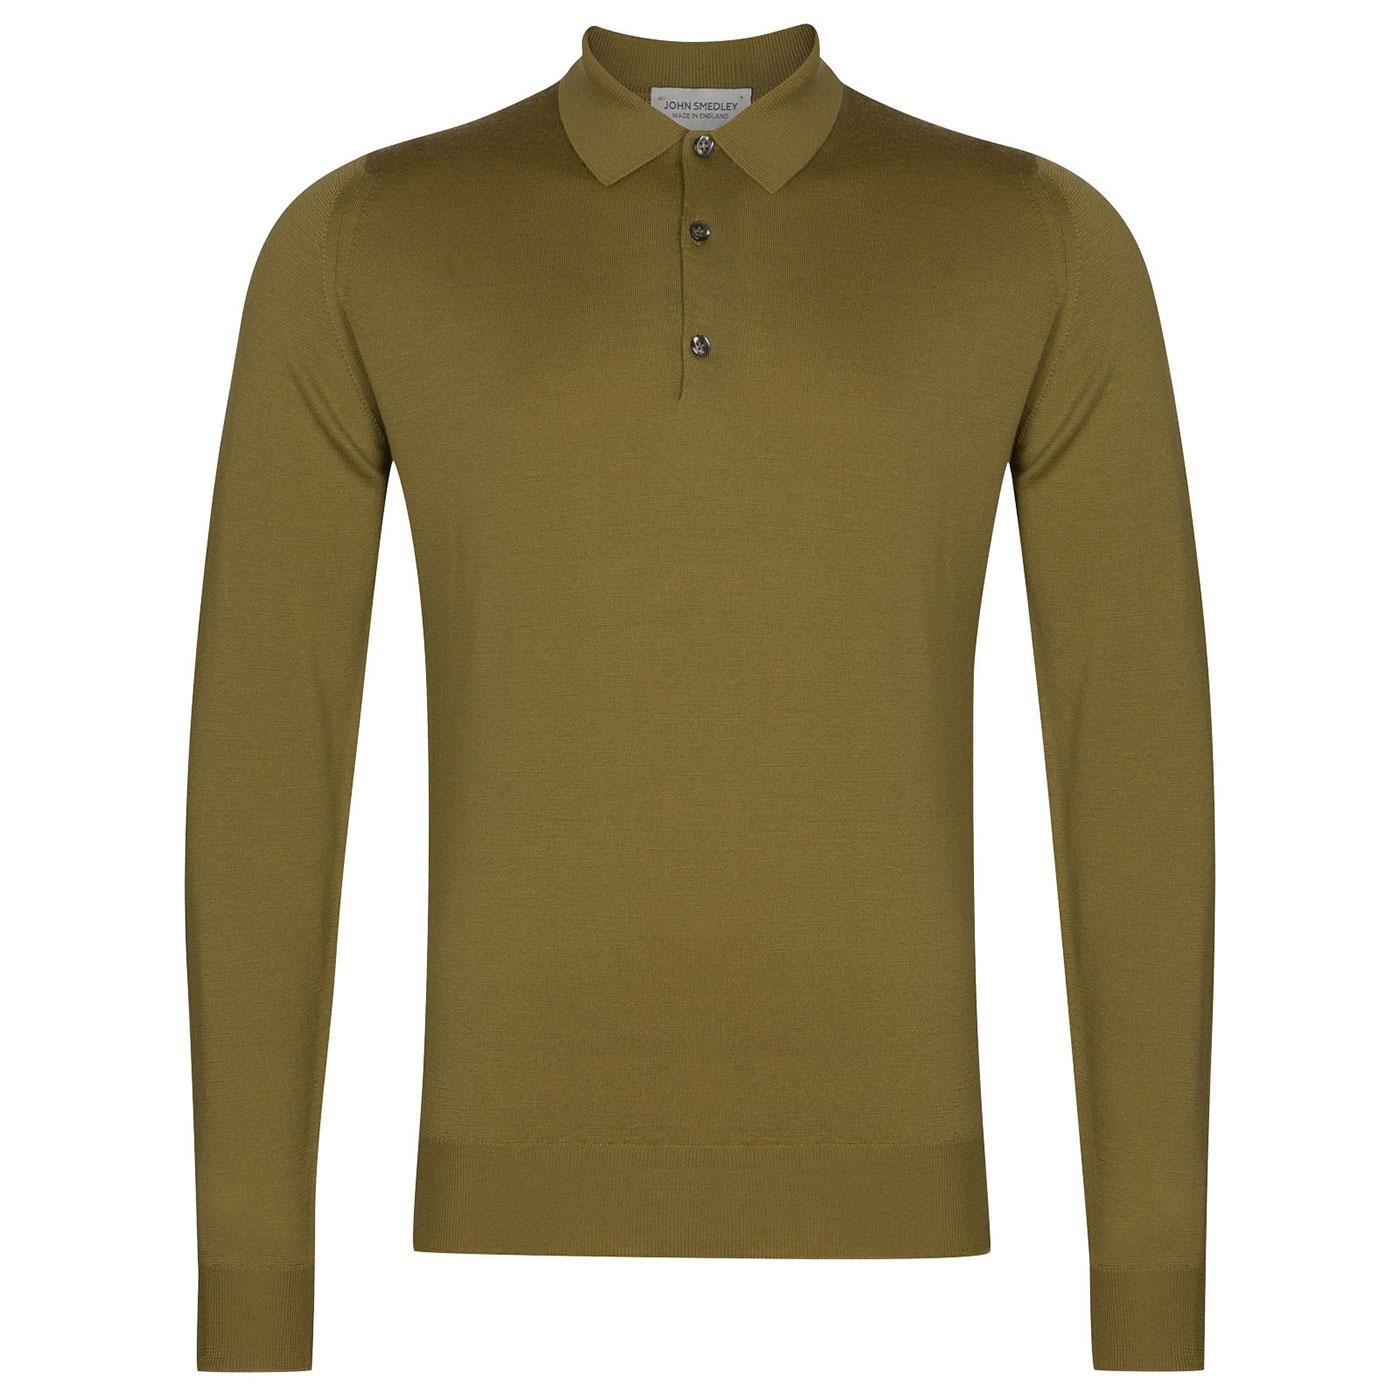 Belper JOHN SMEDLEY Mens Knitted Mod Polo Shirt WG